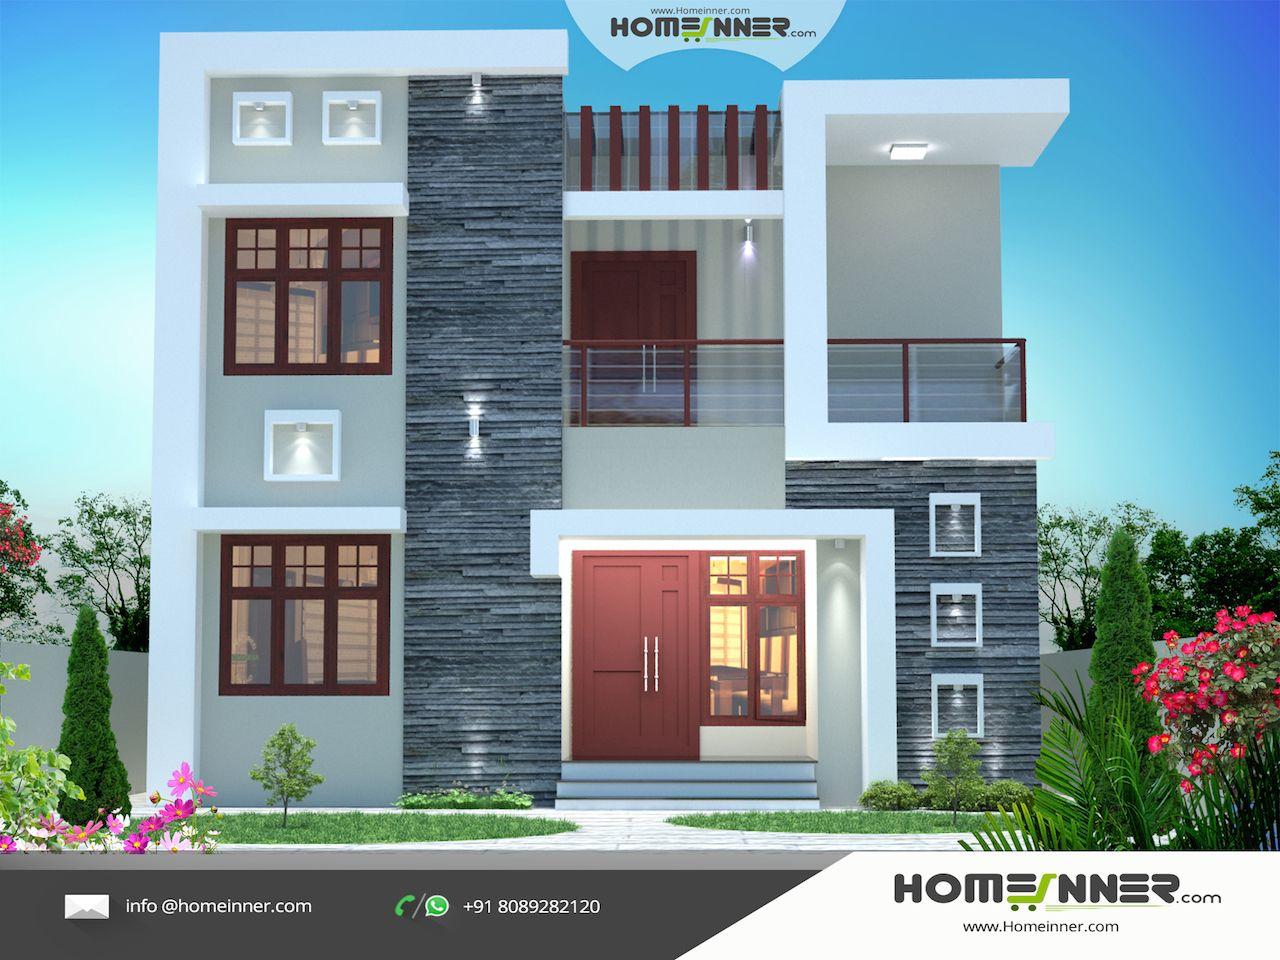 Awesome Exterior Design Of House For You House Designs Exterior